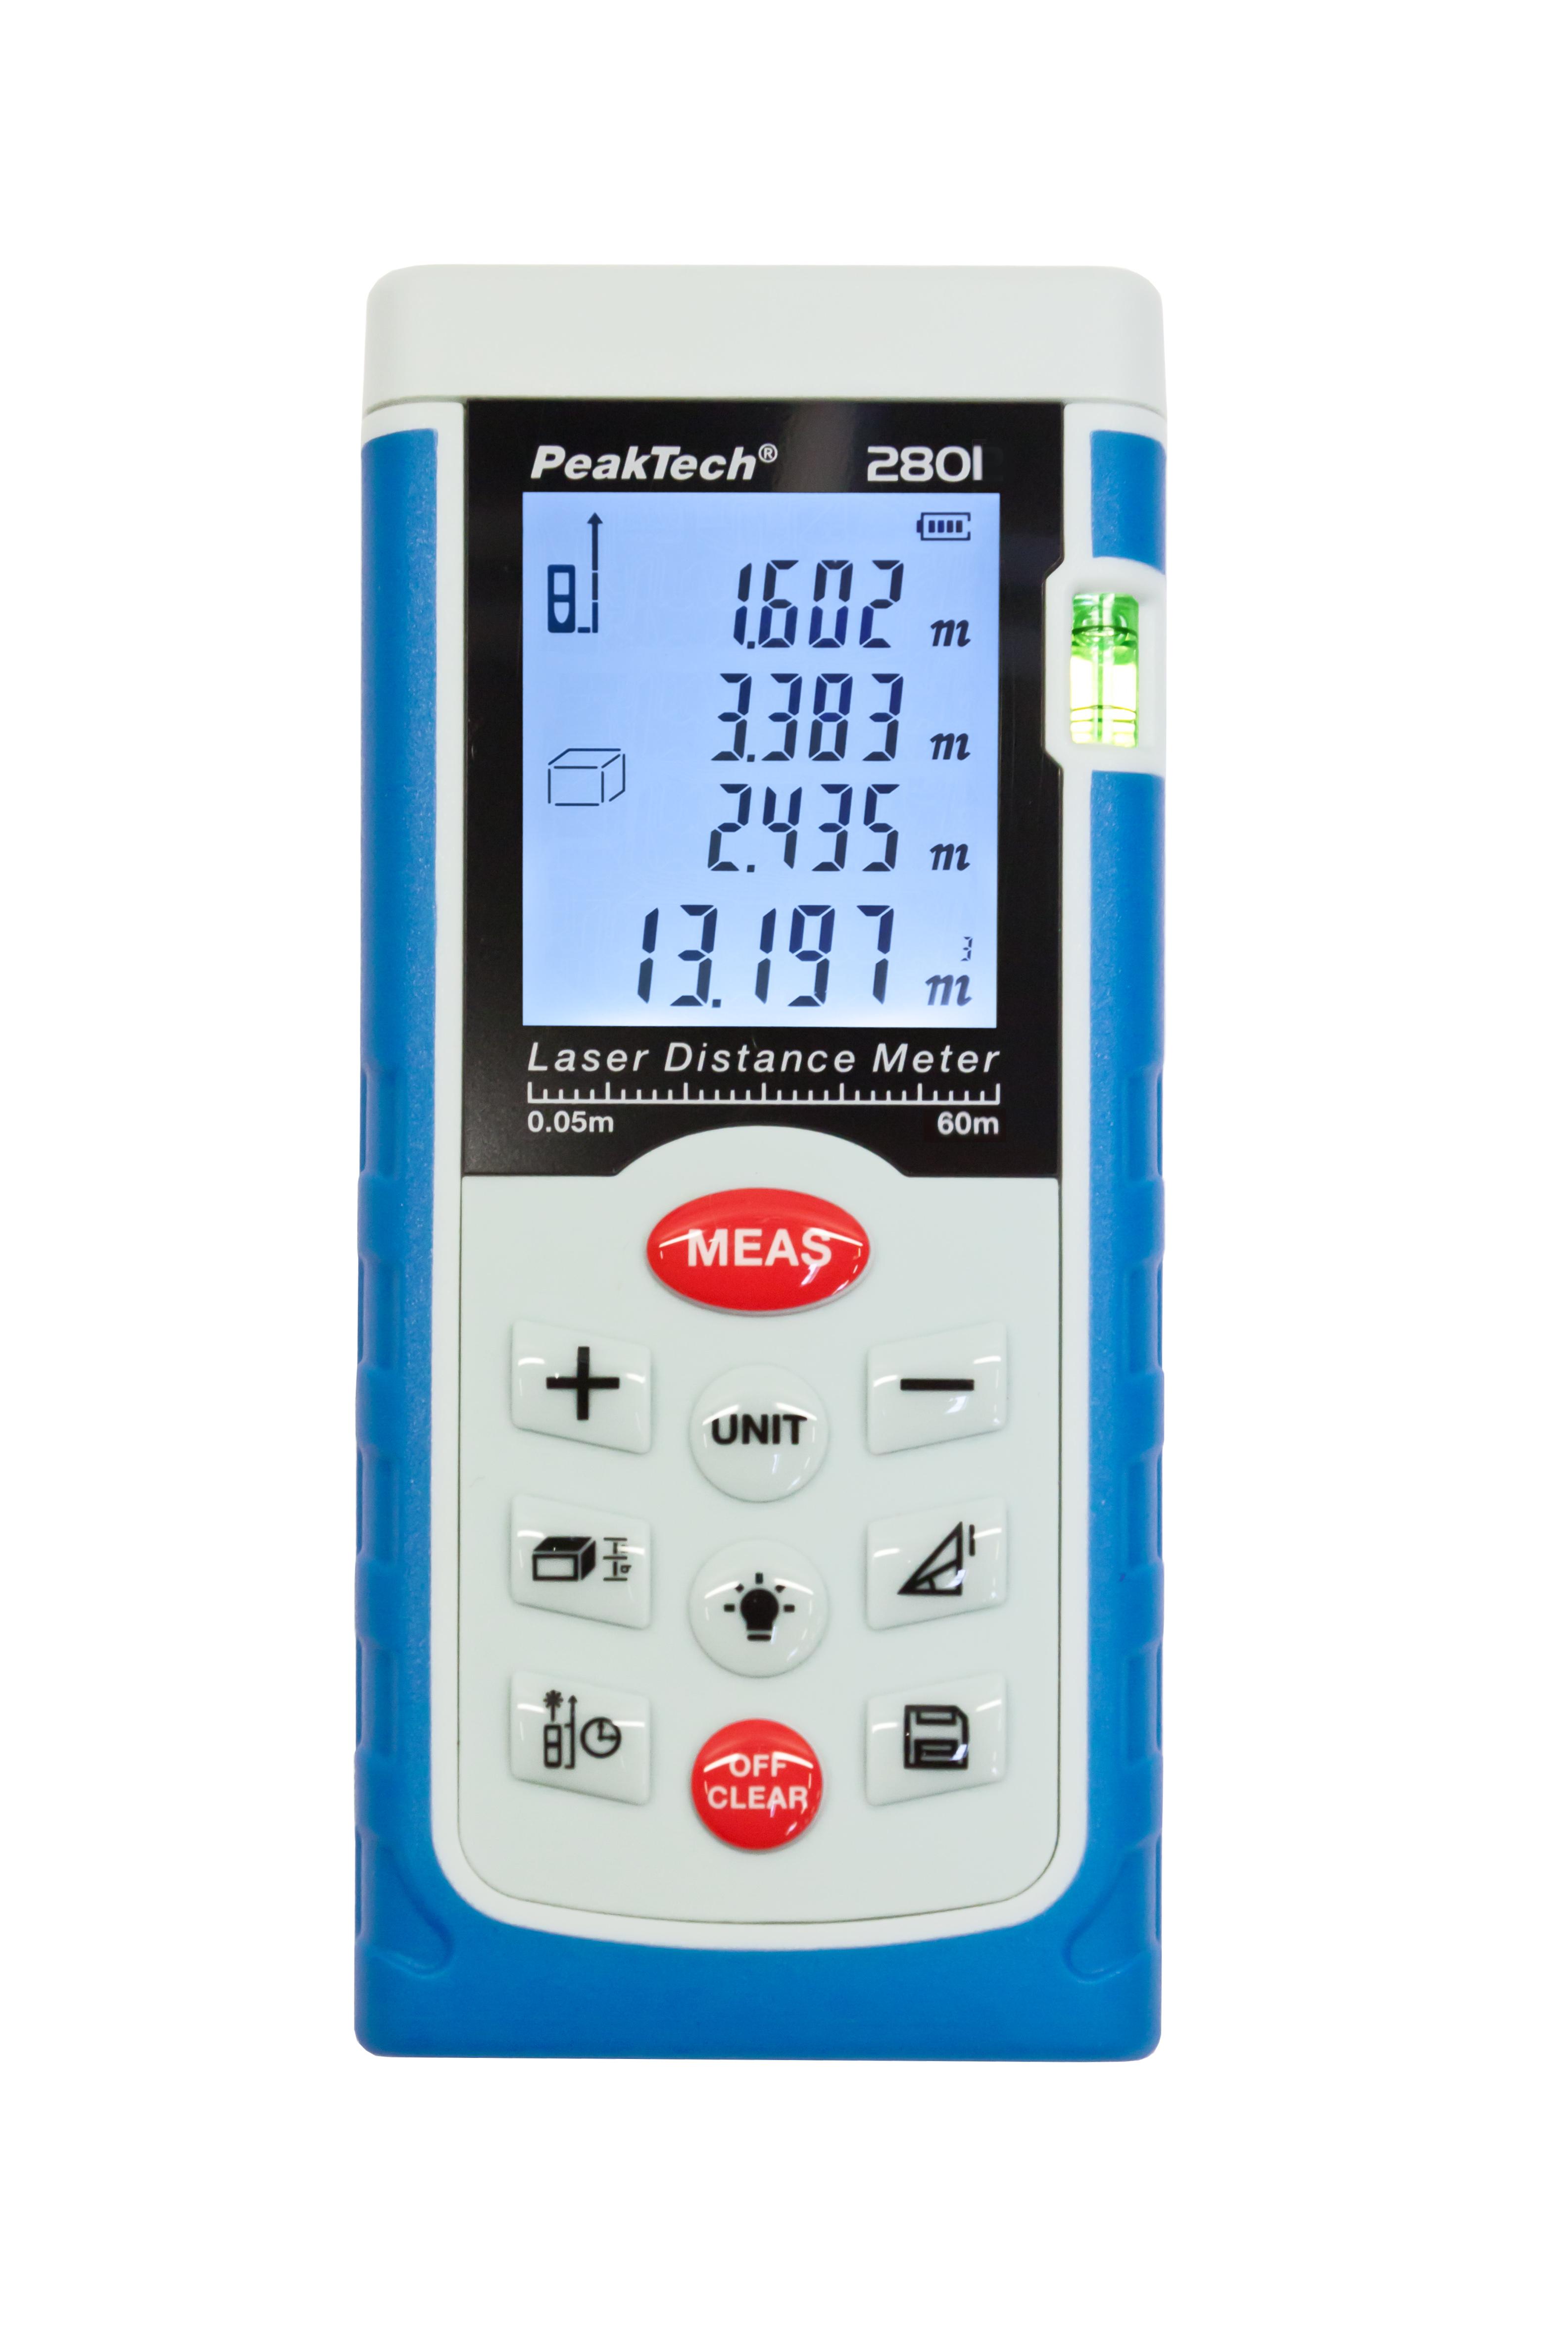 «PeakTech® P 2801» Laser distance meter up to 60 meters